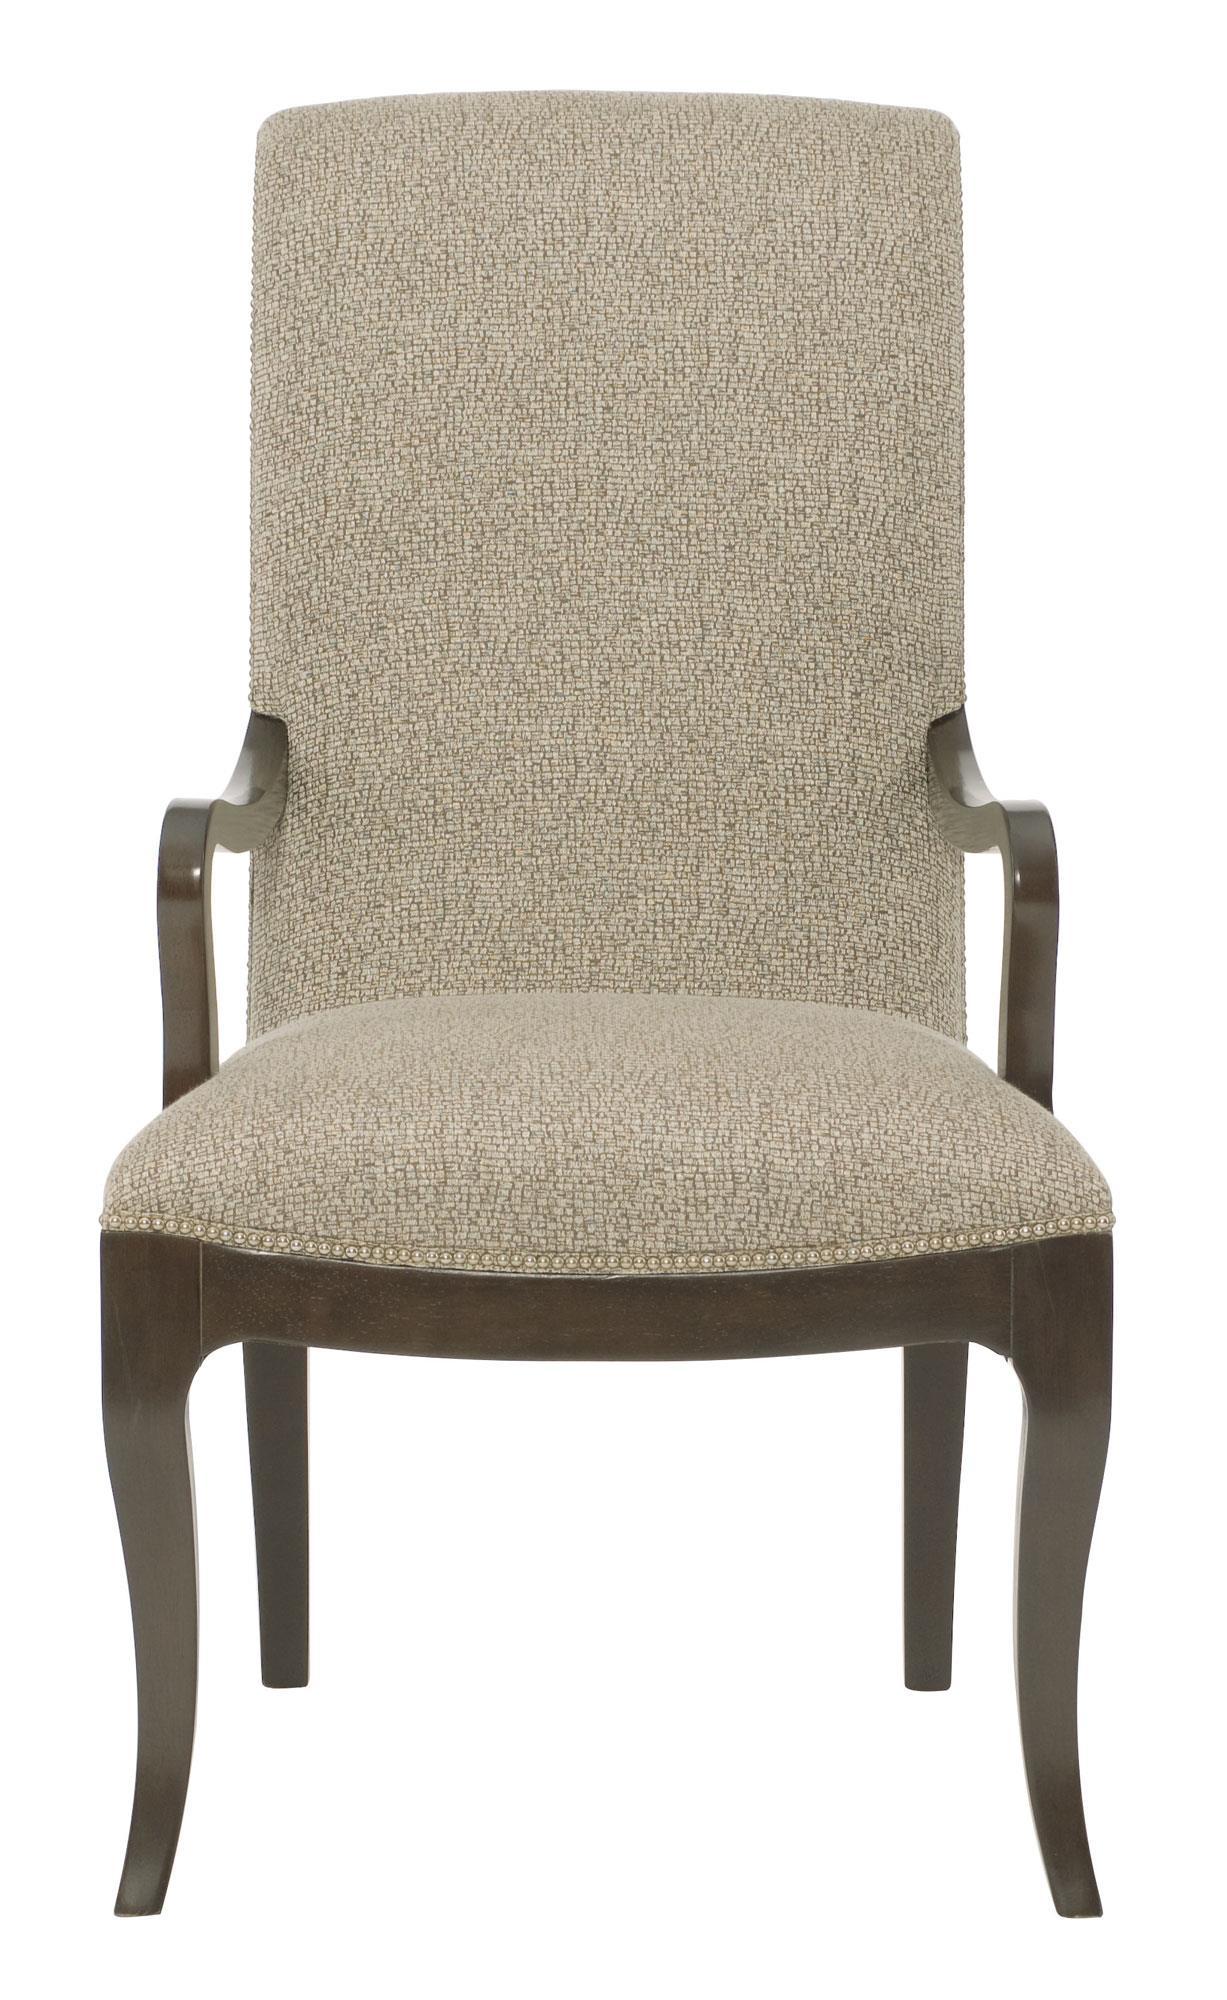 Bernhardt Miramont Arm Chair - Item Number: 360-542